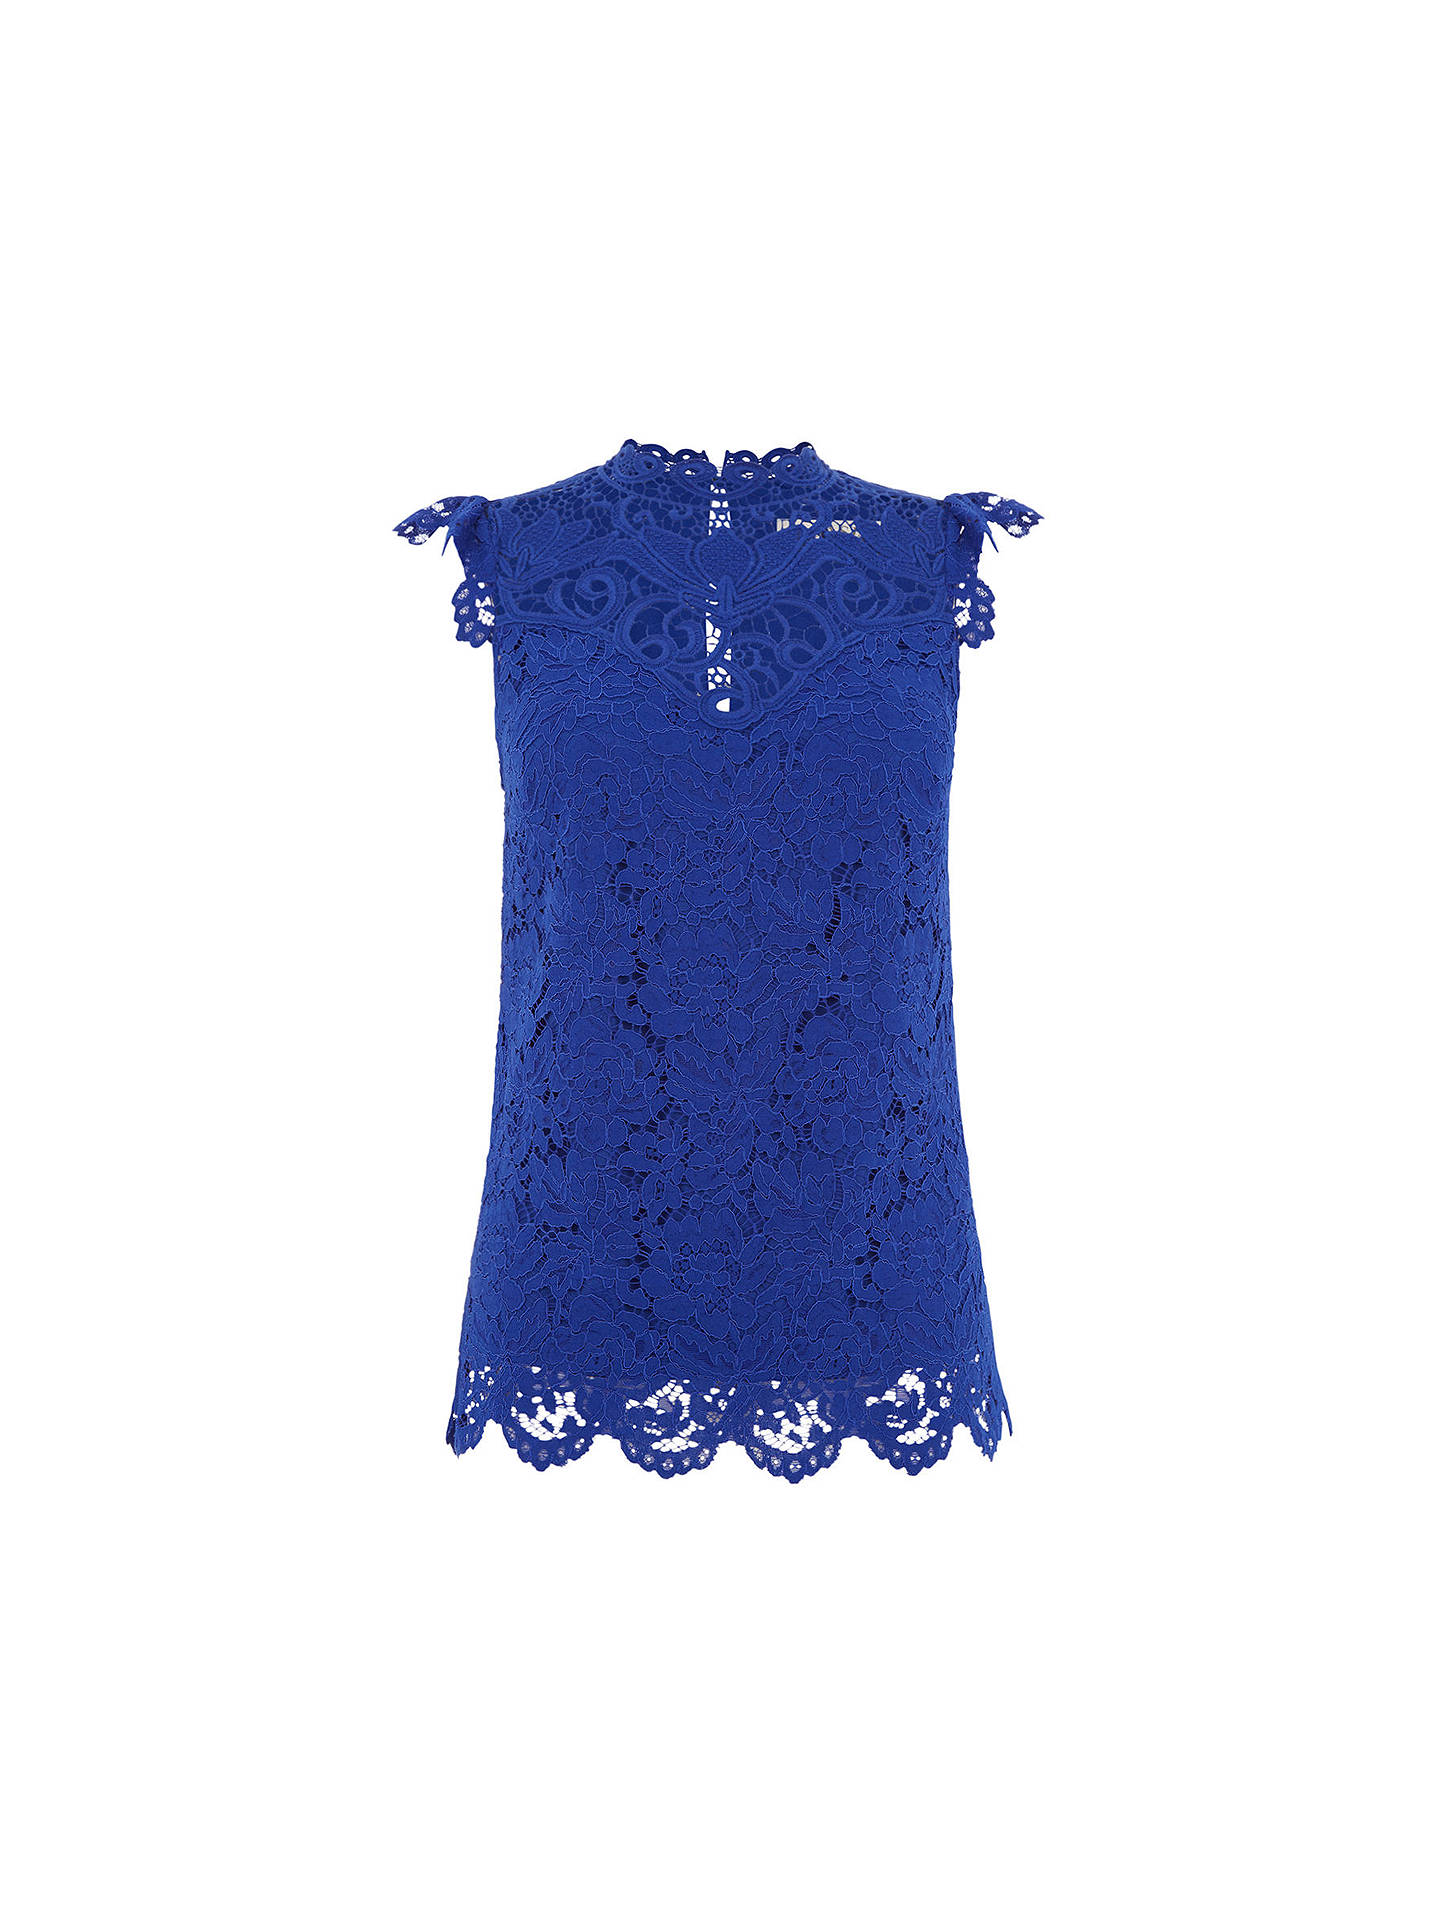 4e31017b286e ... Buy Oasis Lace Trim High Neck Top, Blue, 8 Online at johnlewis.com